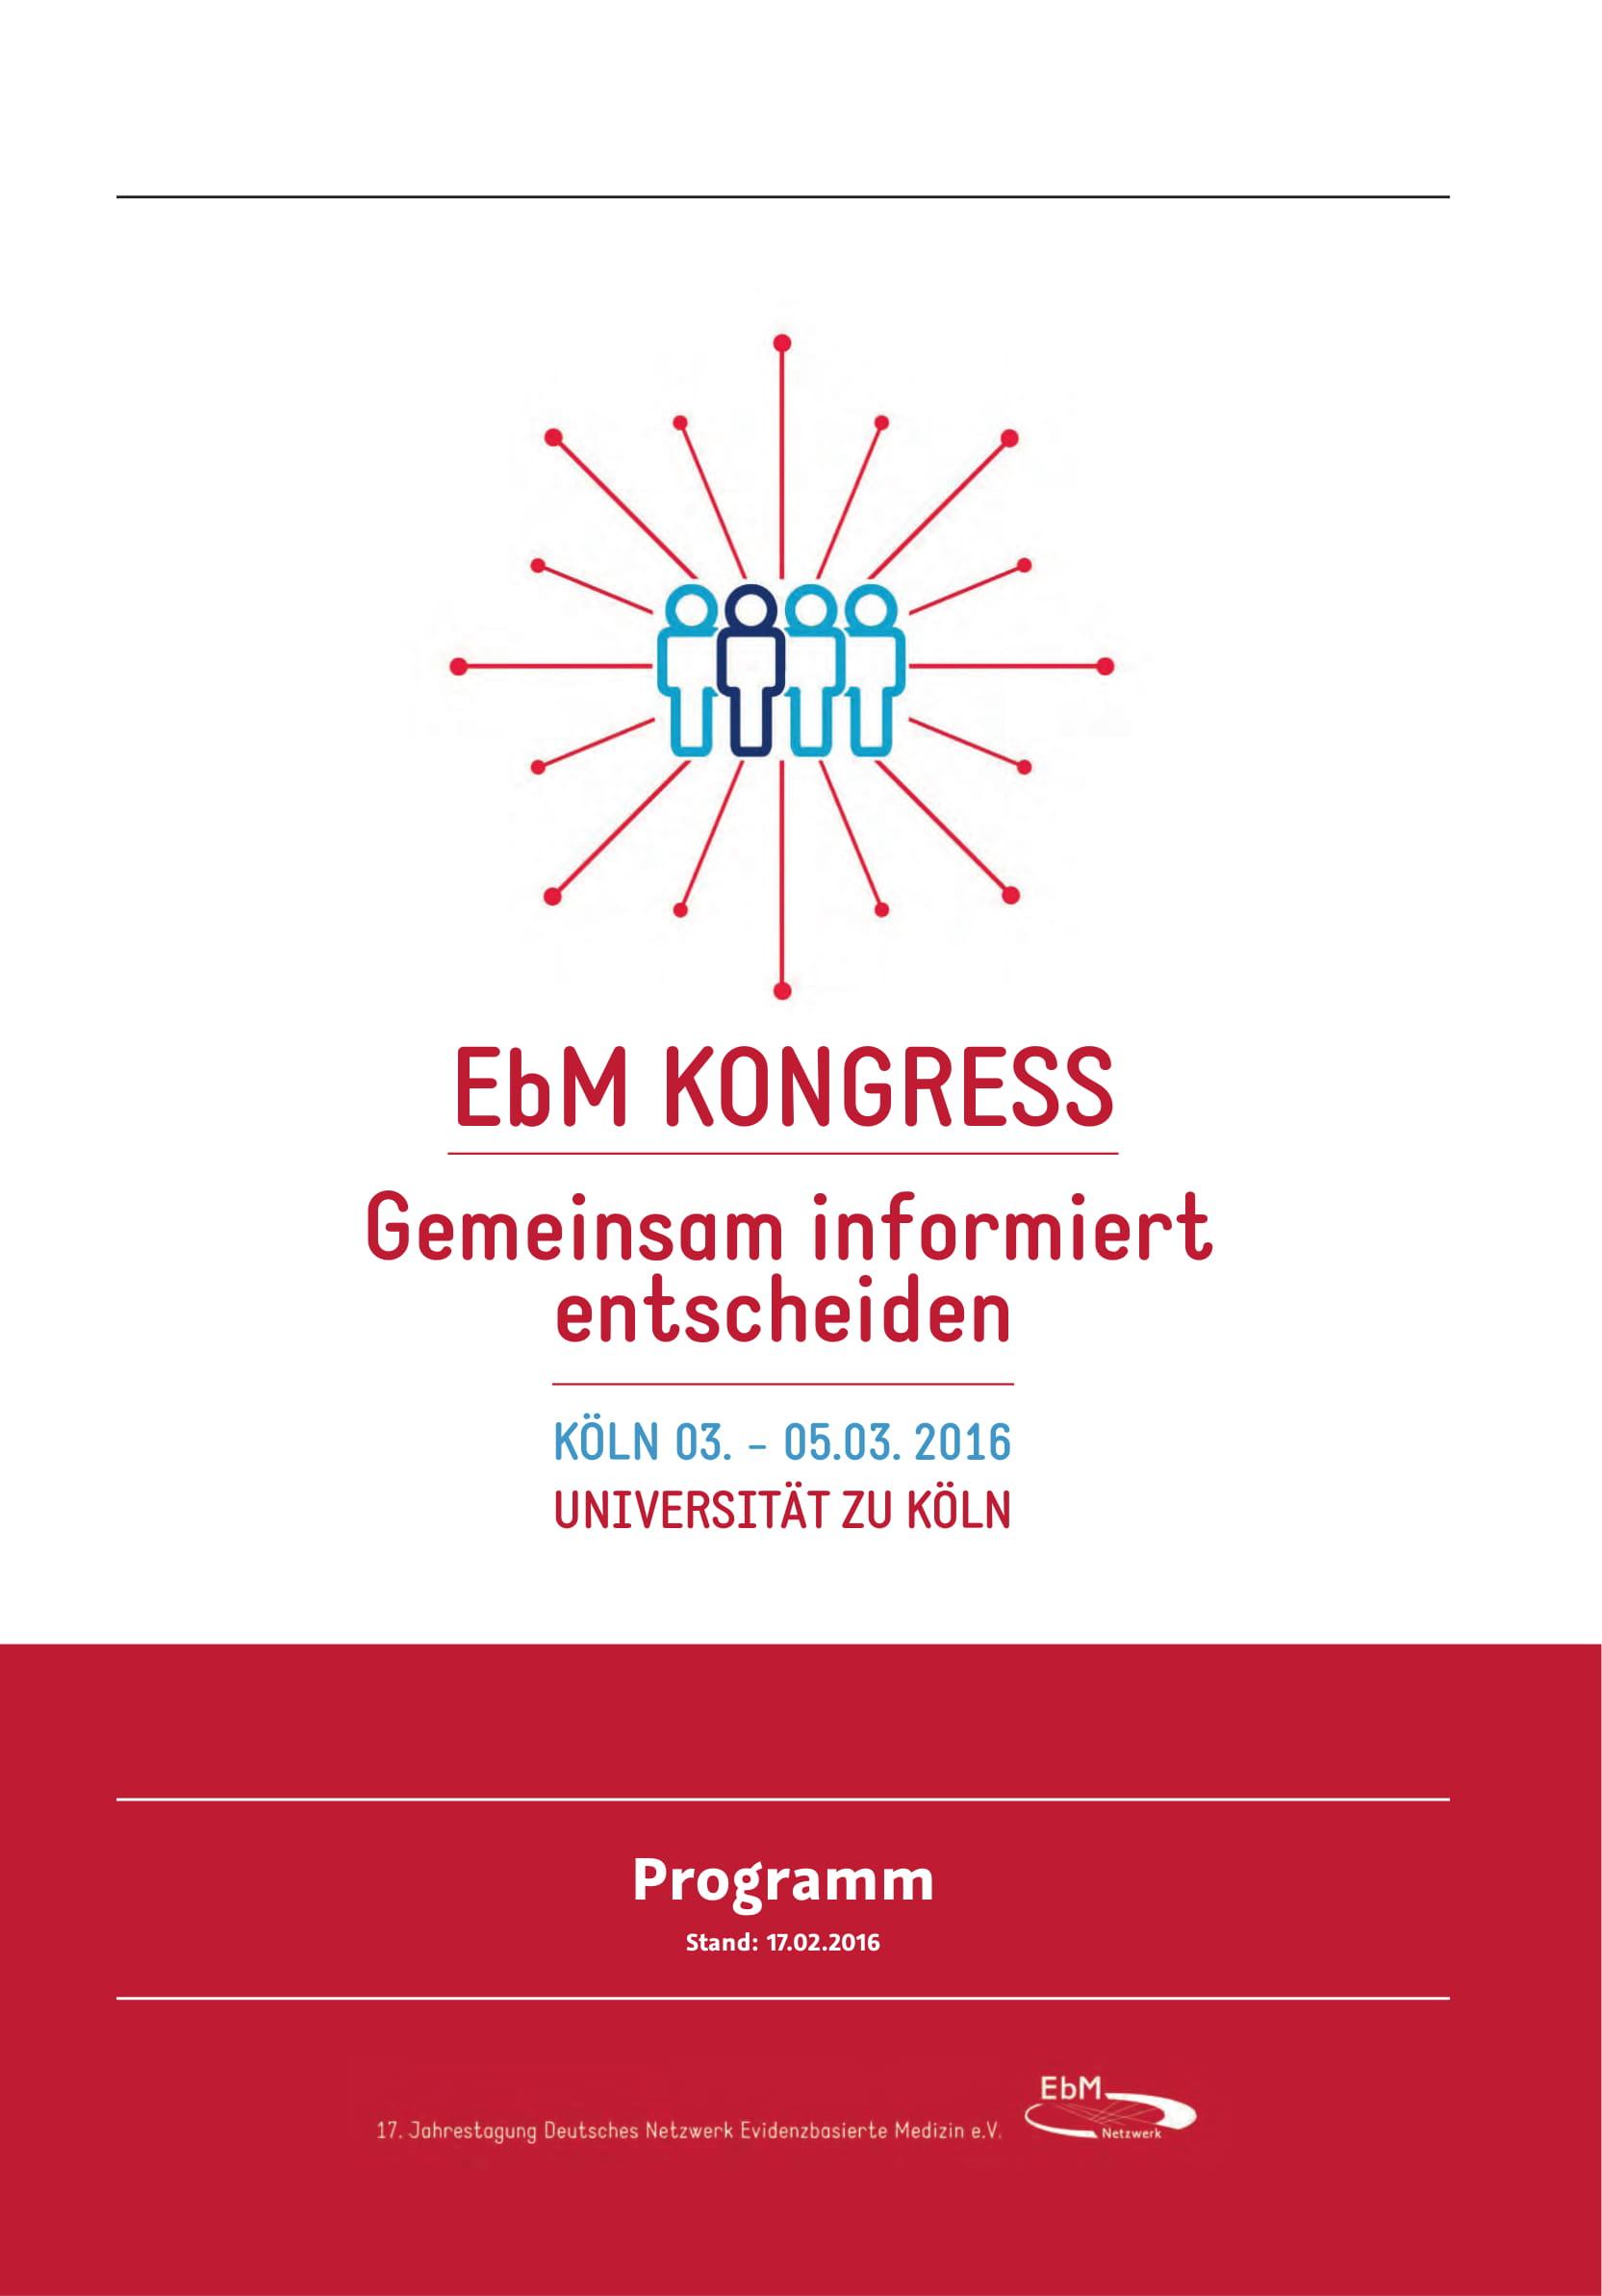 EbM2016-Programmheft-Deckblatt.jpg